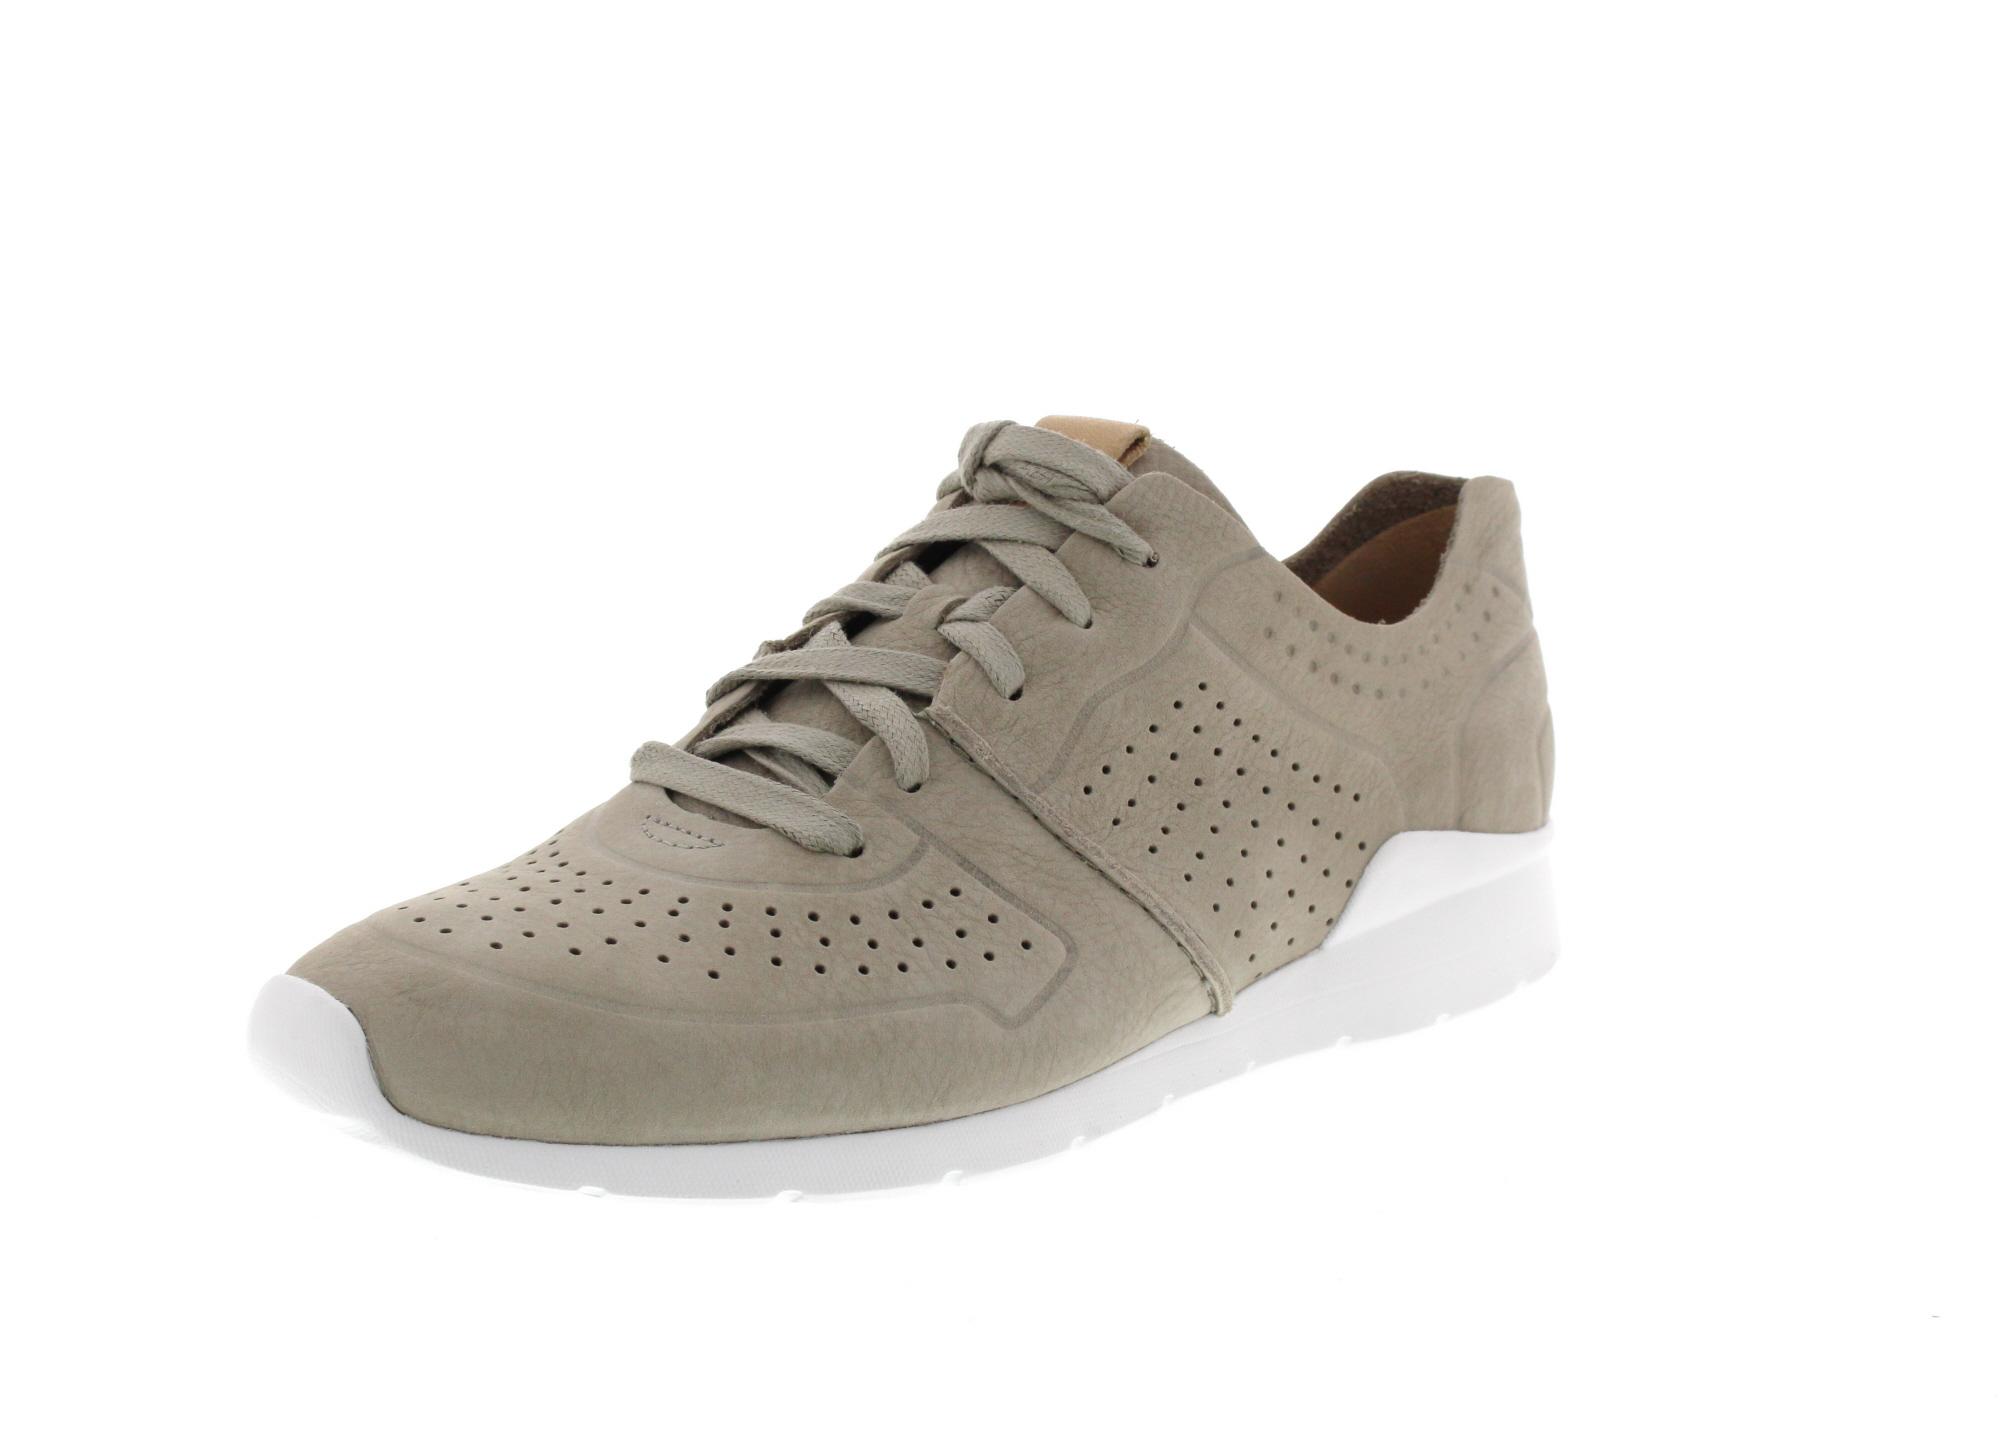 UGG Damenschuhe - Sneakers TYE 1016674 - drizzle_0